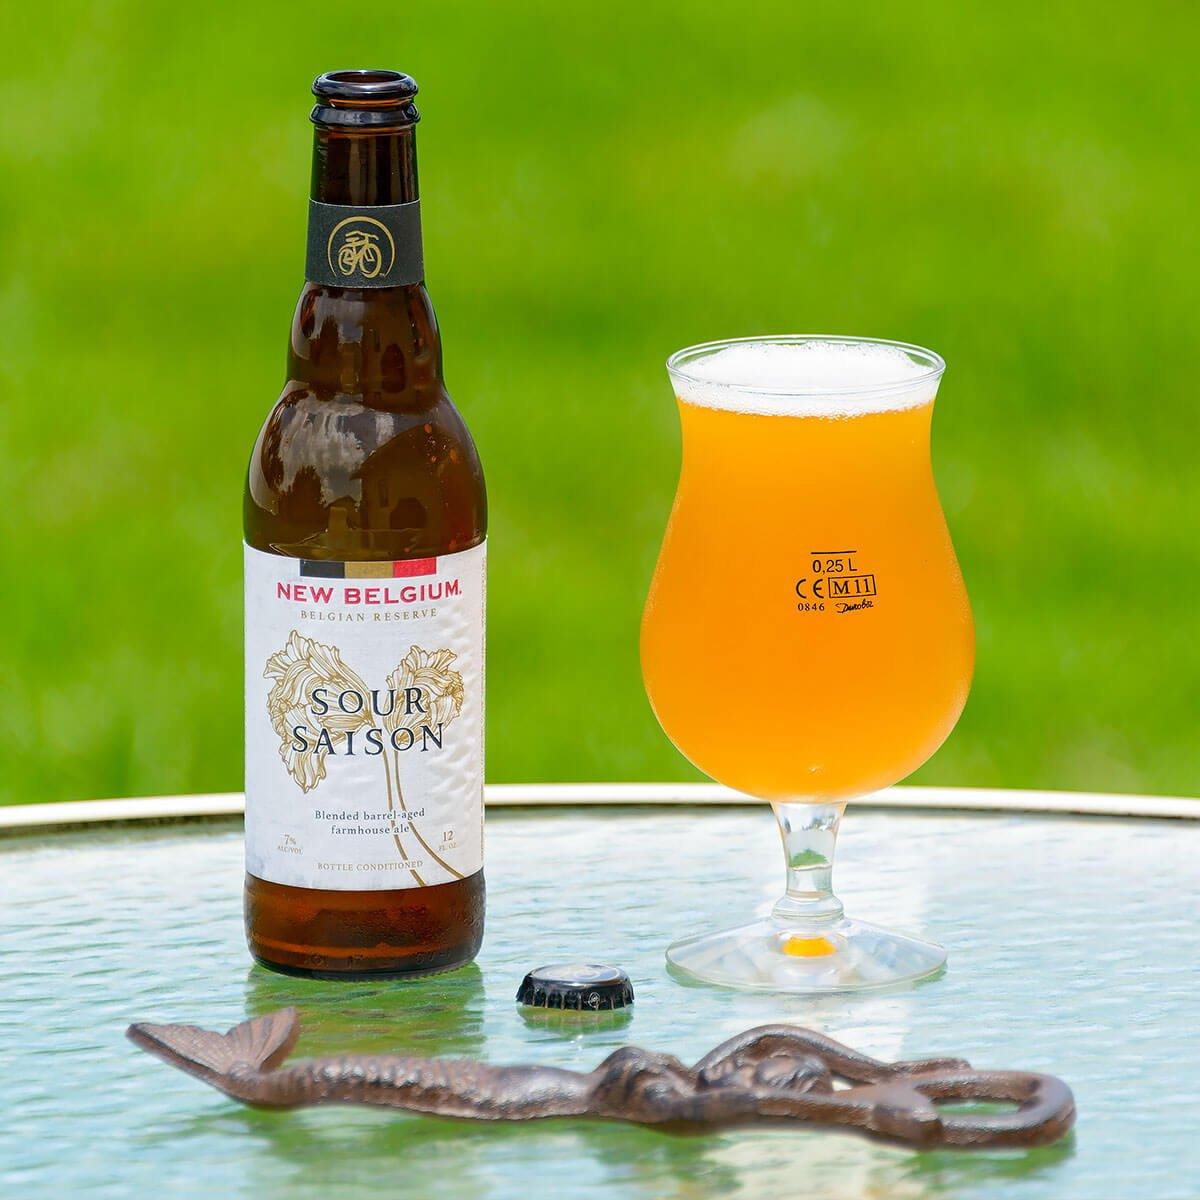 Sour Saison, a Belgian-style Saison by New Belgium Brewing Company